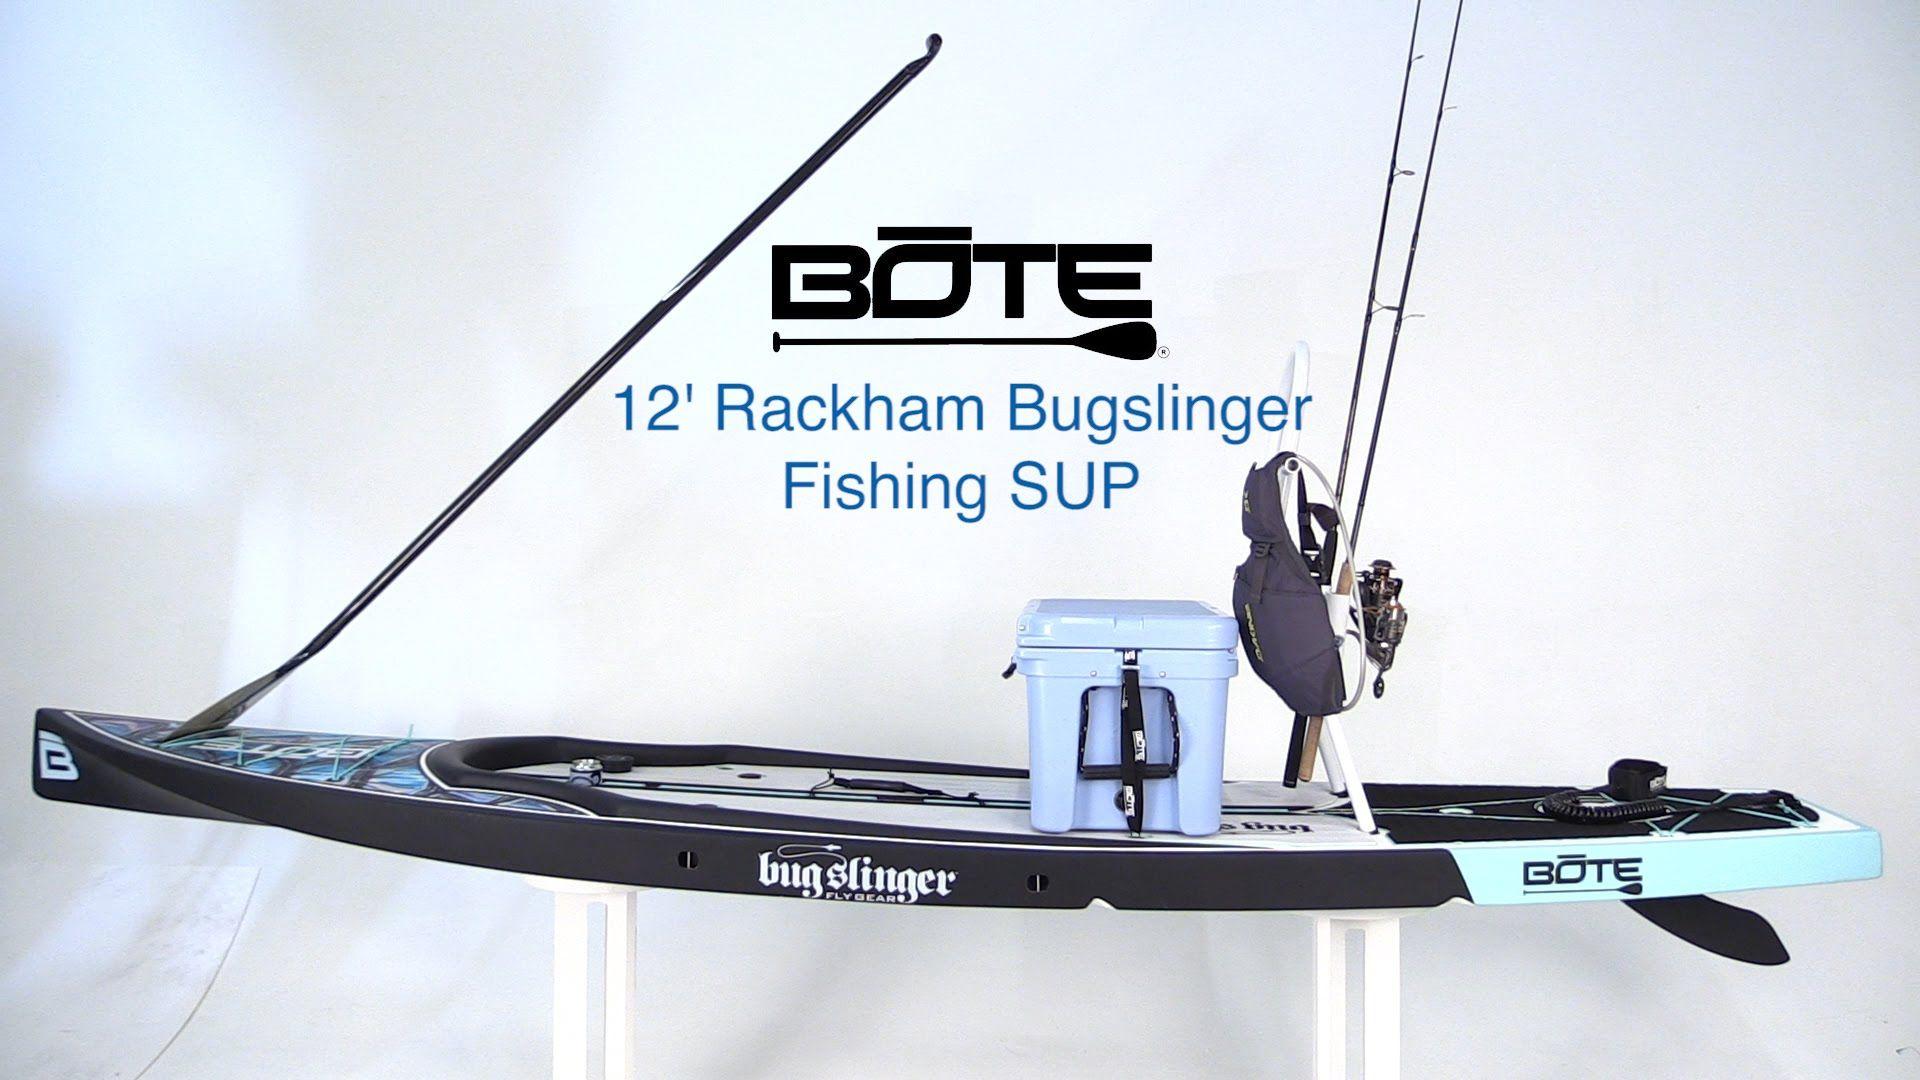 Bote 12 39 rackham bugslinger fishing sup west marine for Fishing sup boards